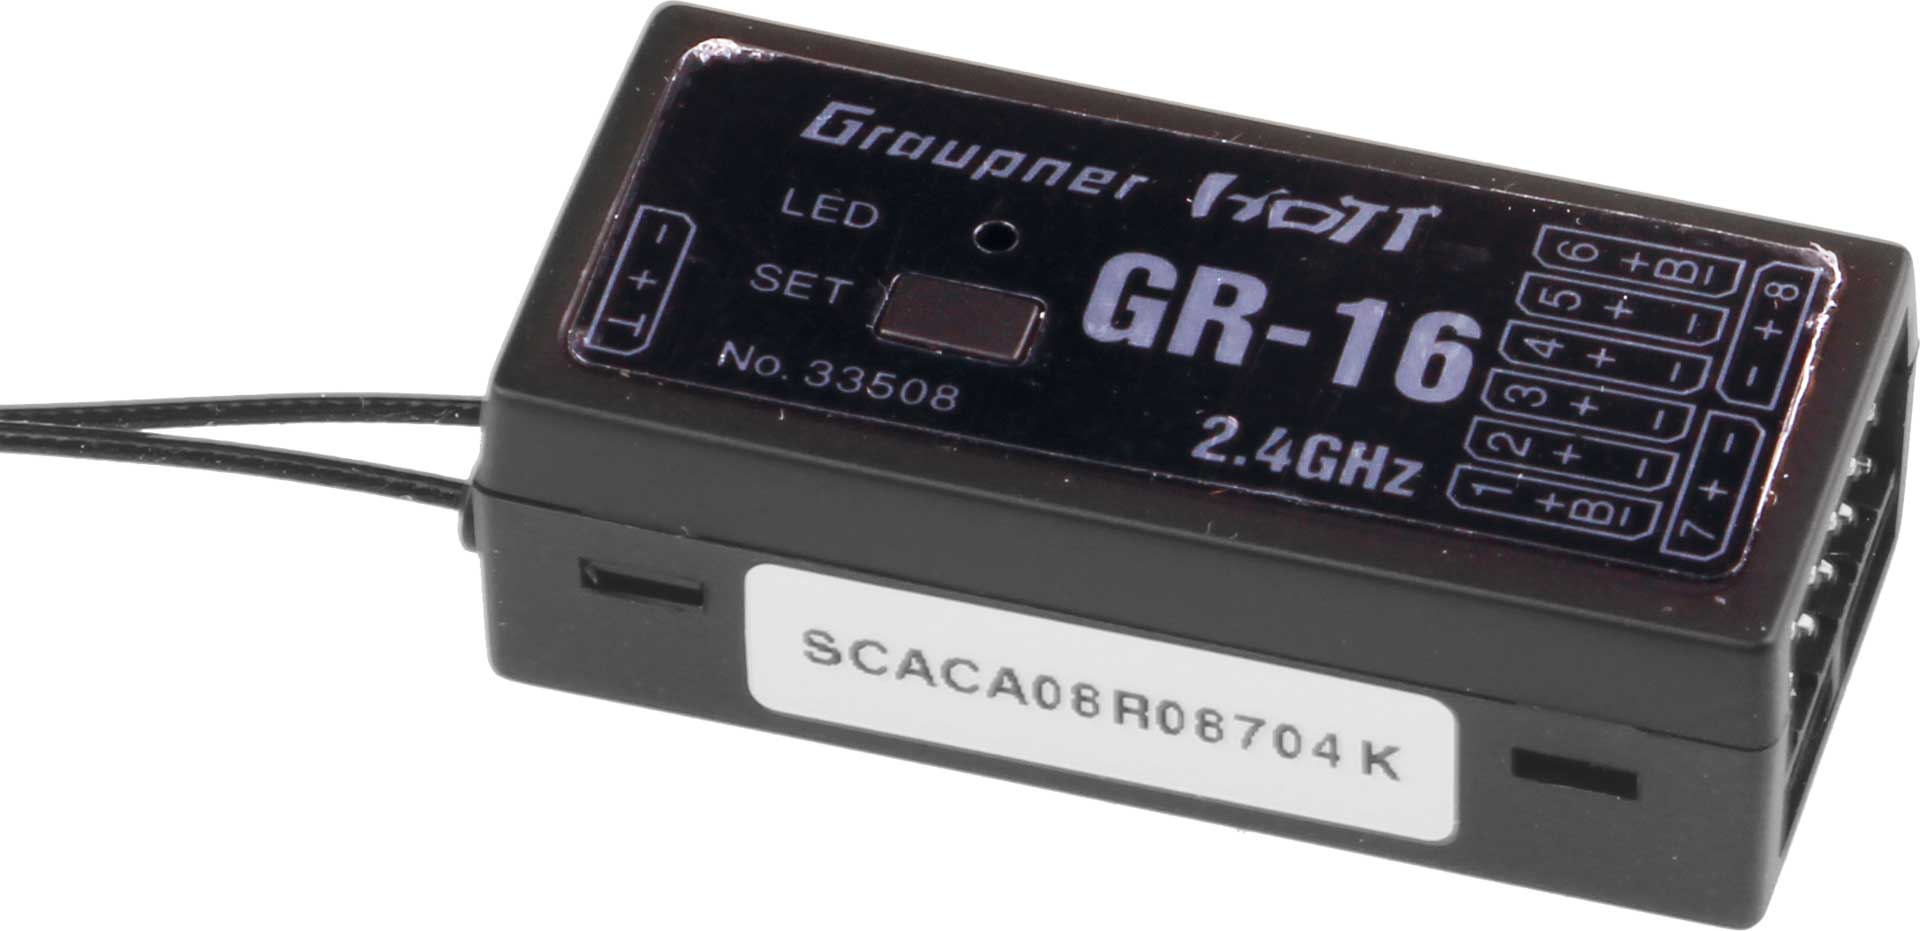 GRAUPNER GR-16 2,4GHZ HOTT 8K EMPFÄNGER